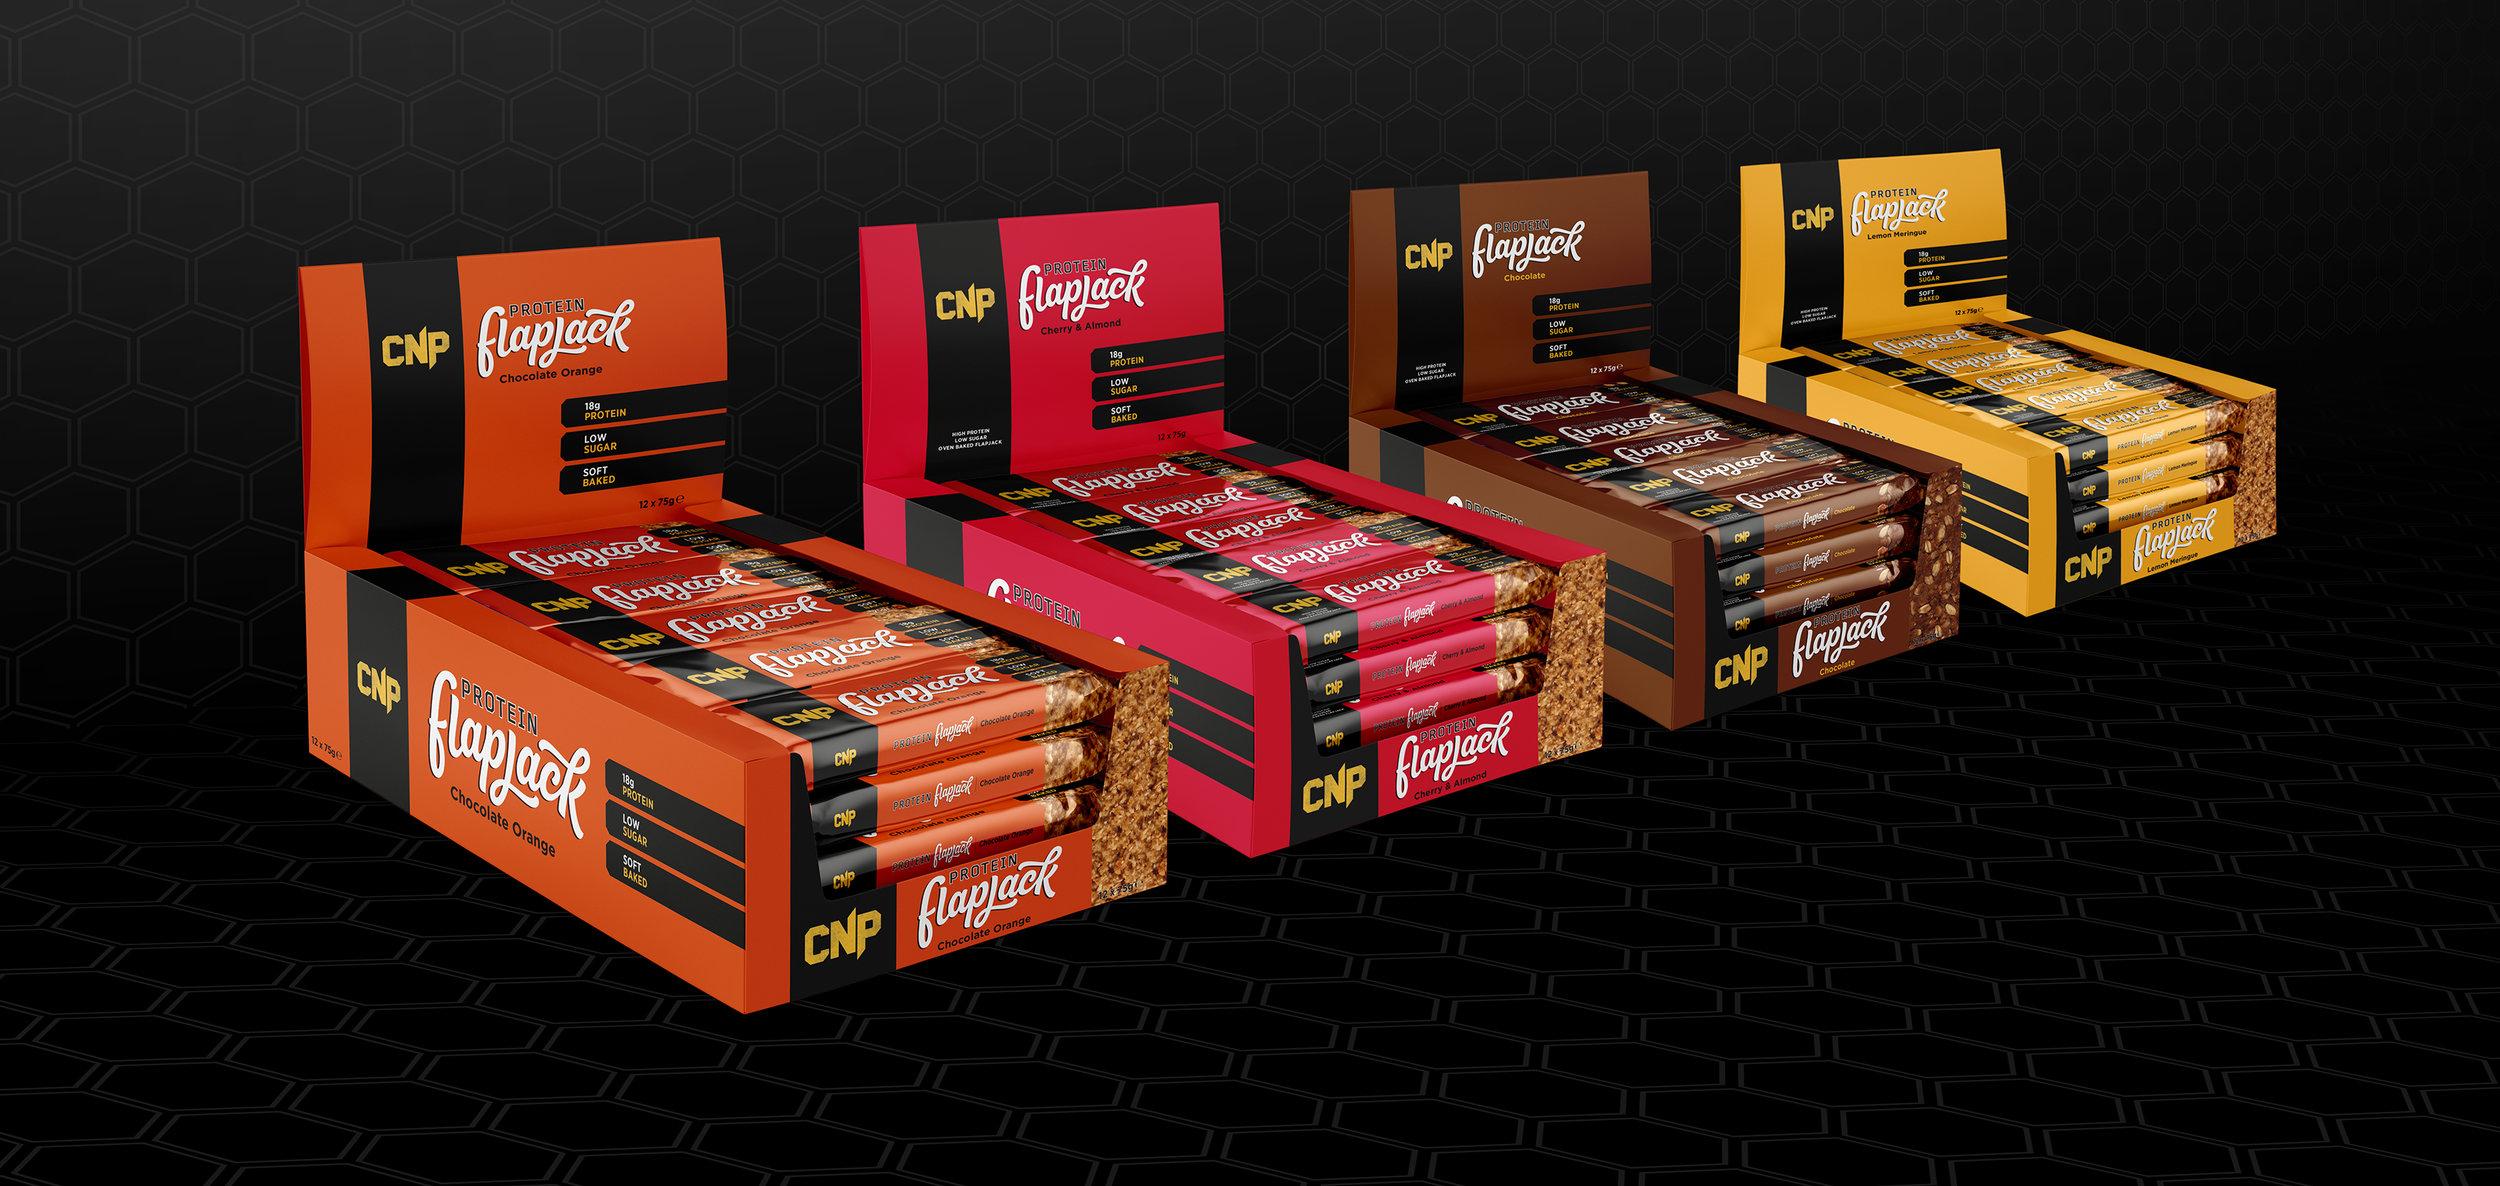 CNP Protein Flapjack Retail Box Design